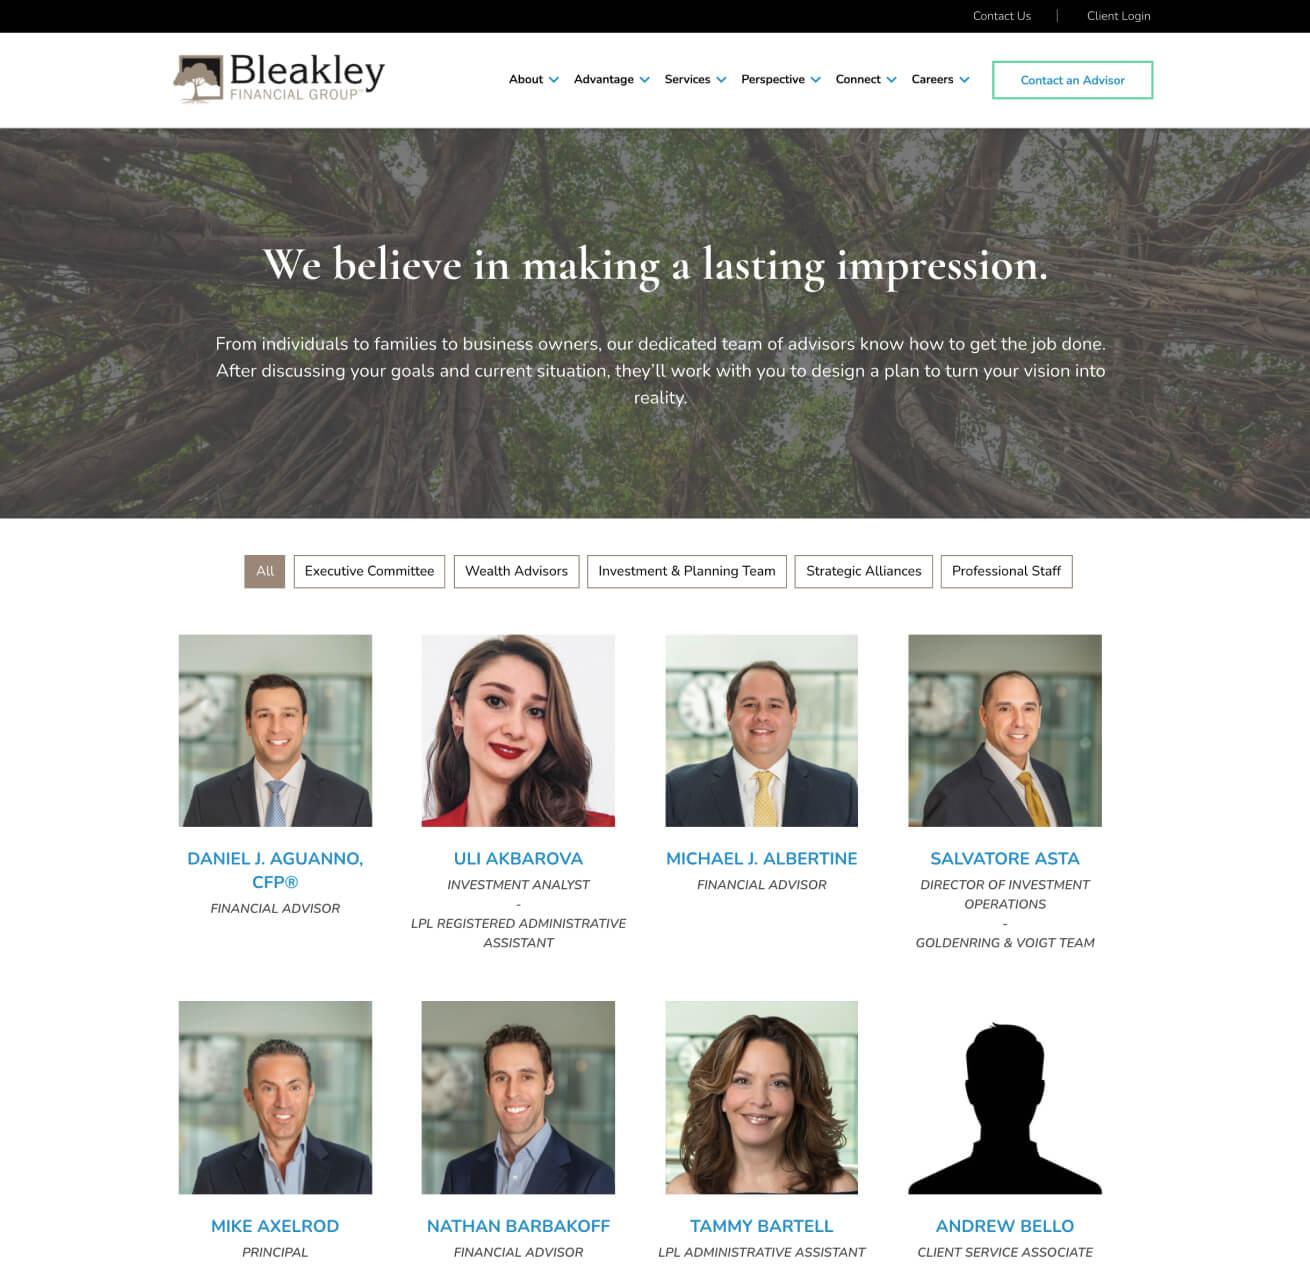 Bleakley Financial Employee Directory Page